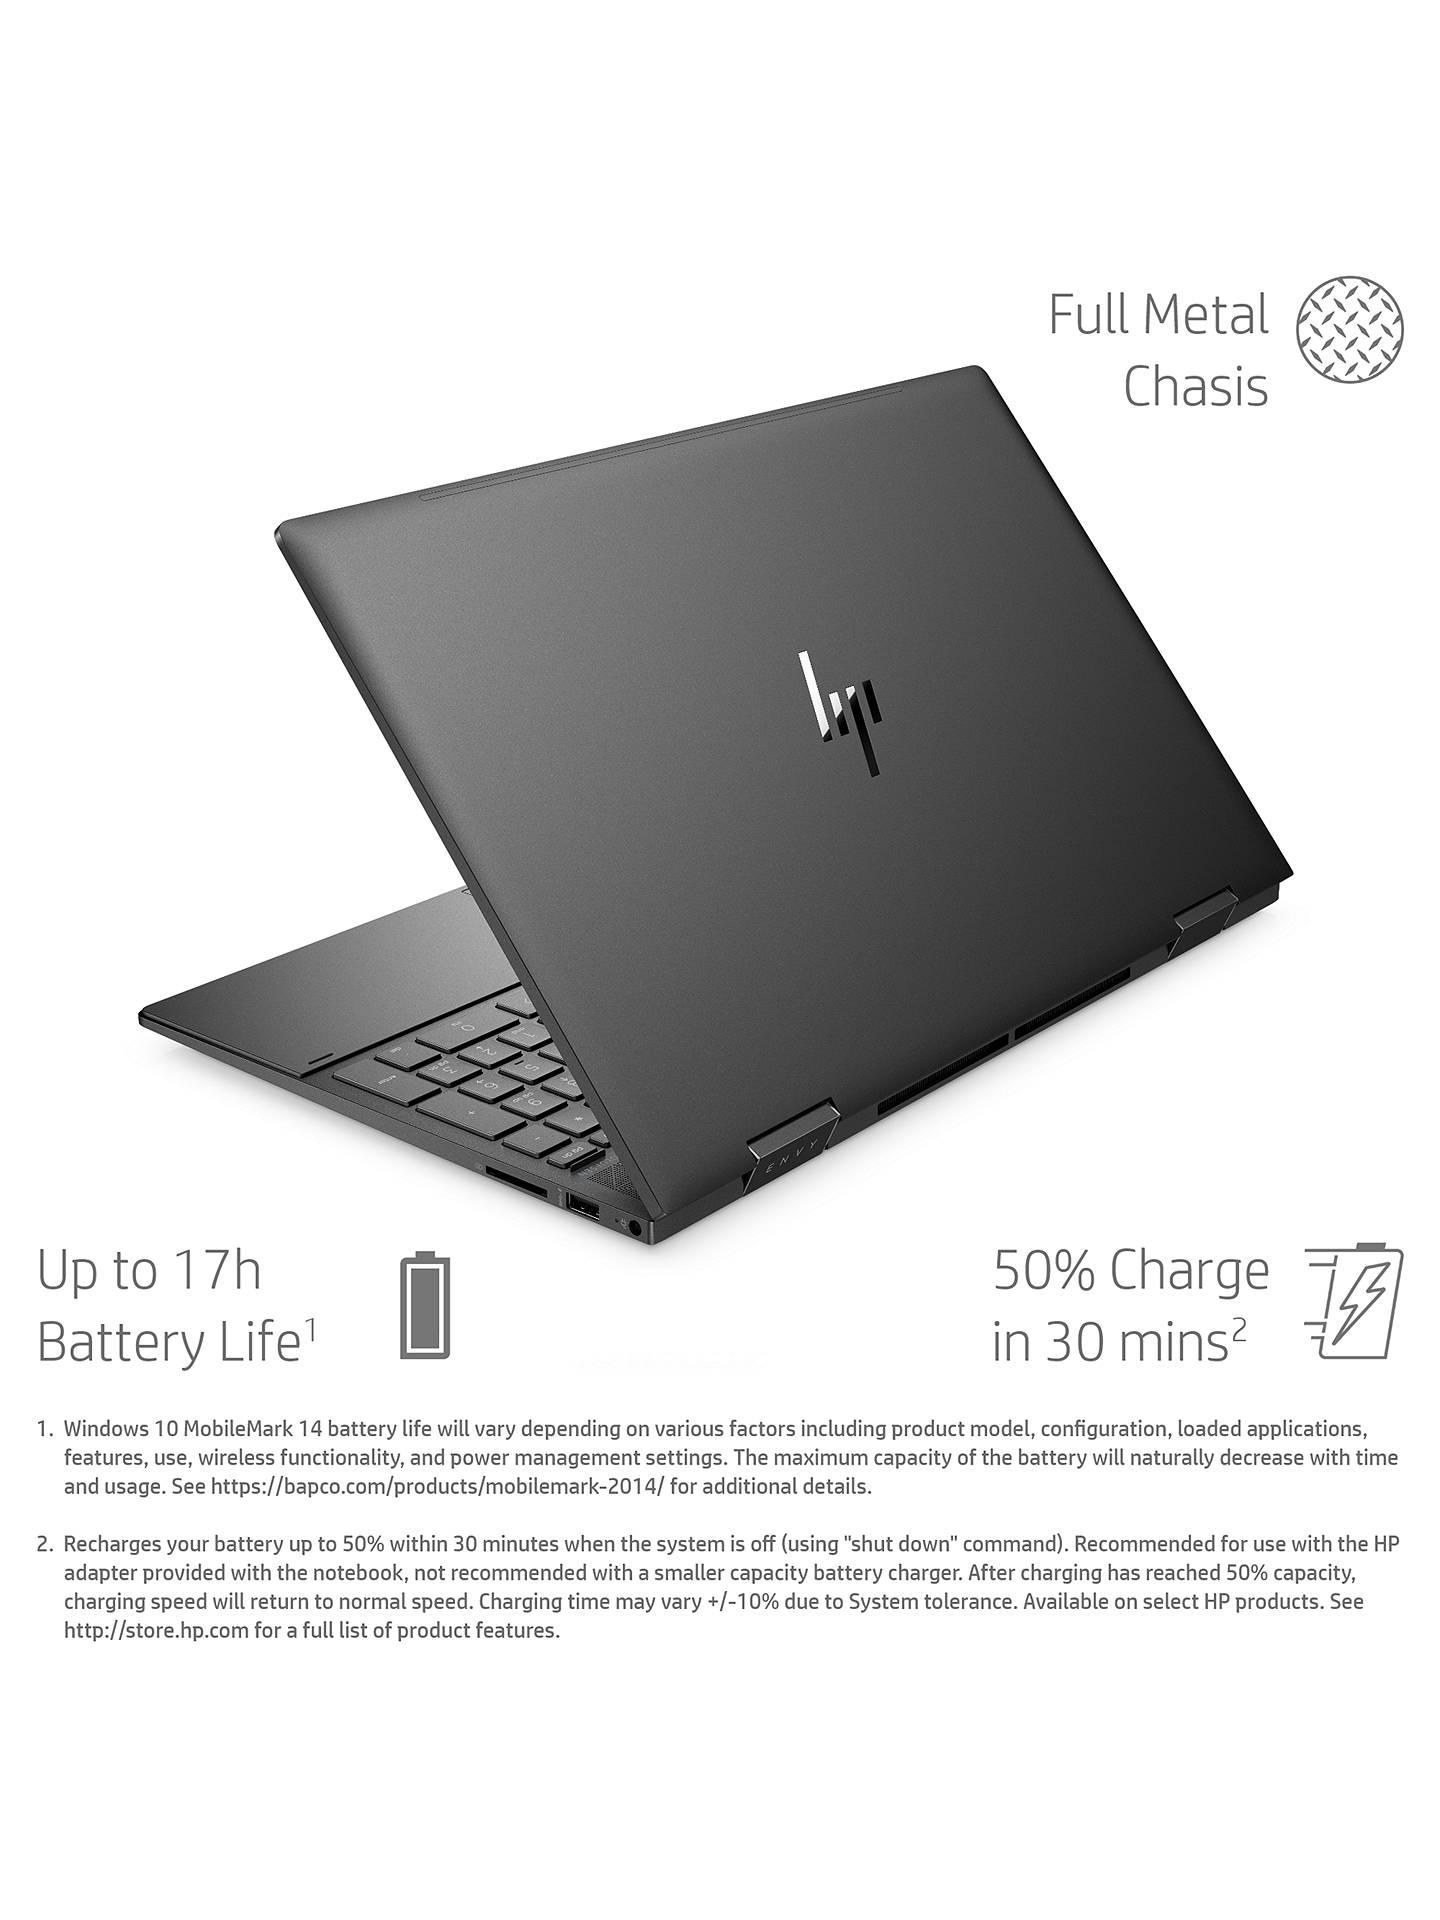 Hp Envy X360 15 Ee0000na Convertible Laptop Amd Ryzen 5 Processor 8gb Ram 512gb Ssd 15 6 Full Hd Black At John Lewis Partners